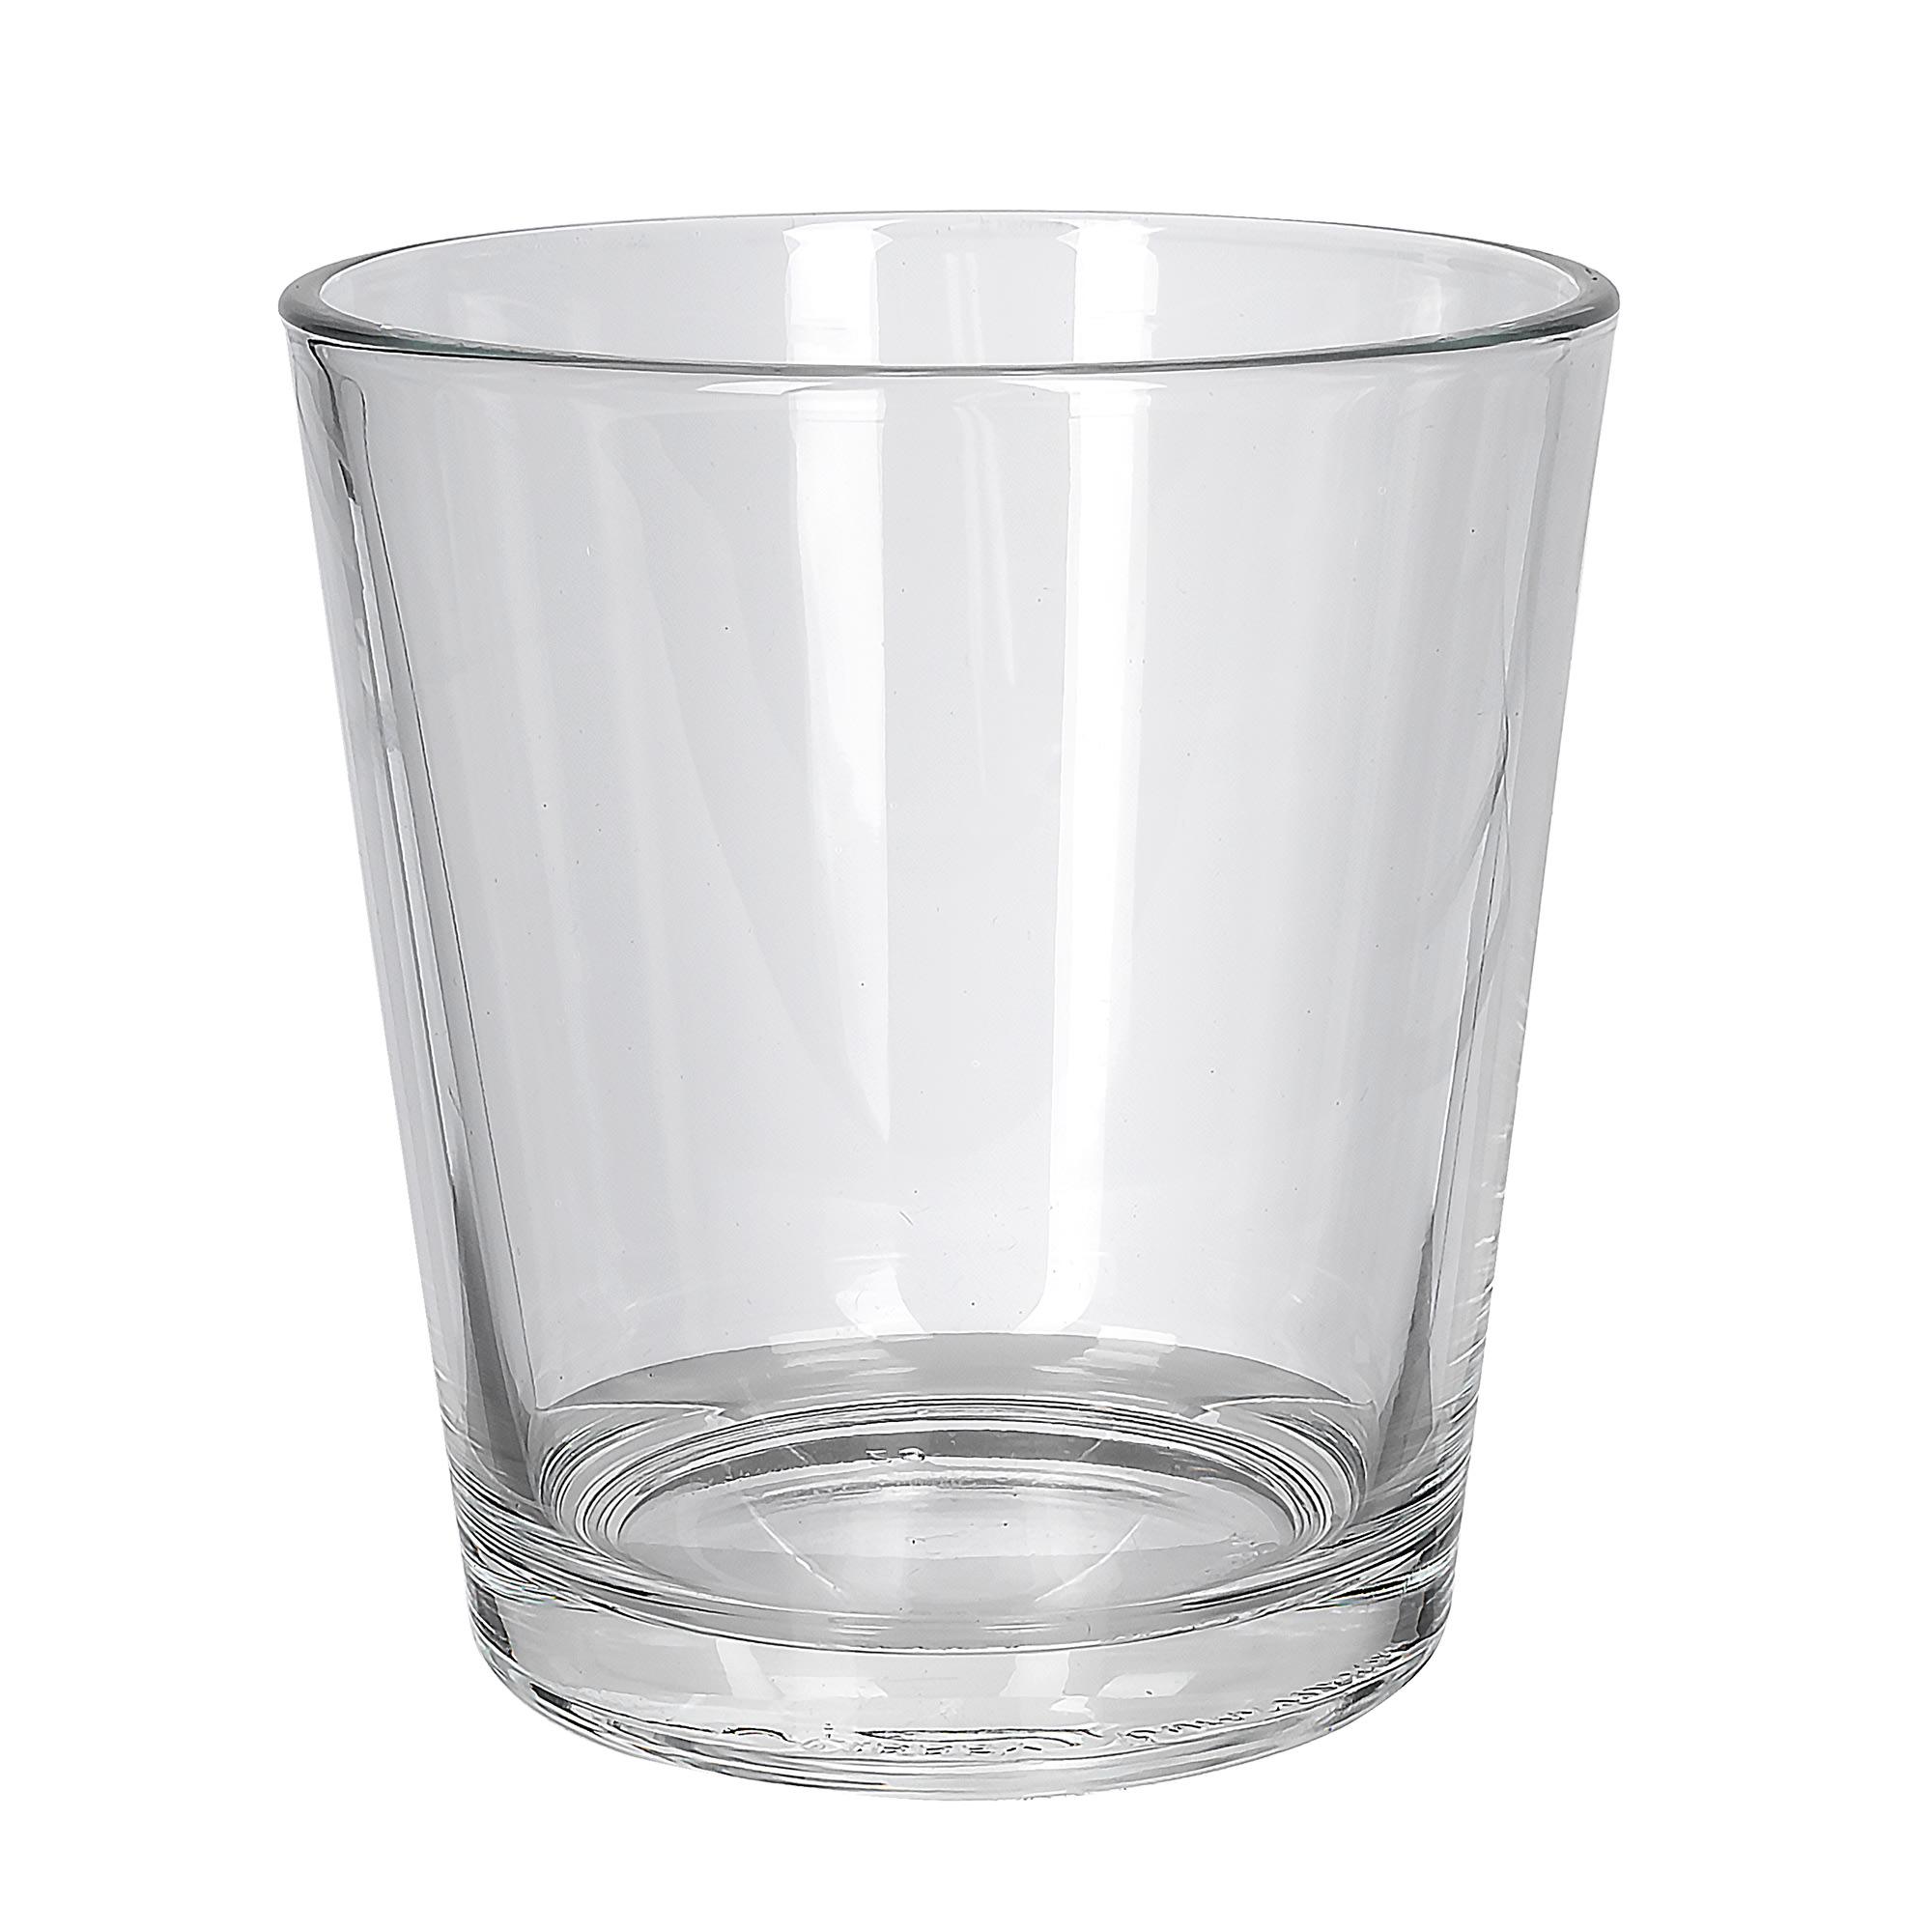 Libbey 15587 12-oz Double Old Fashioned Glass - Restaurant Basics